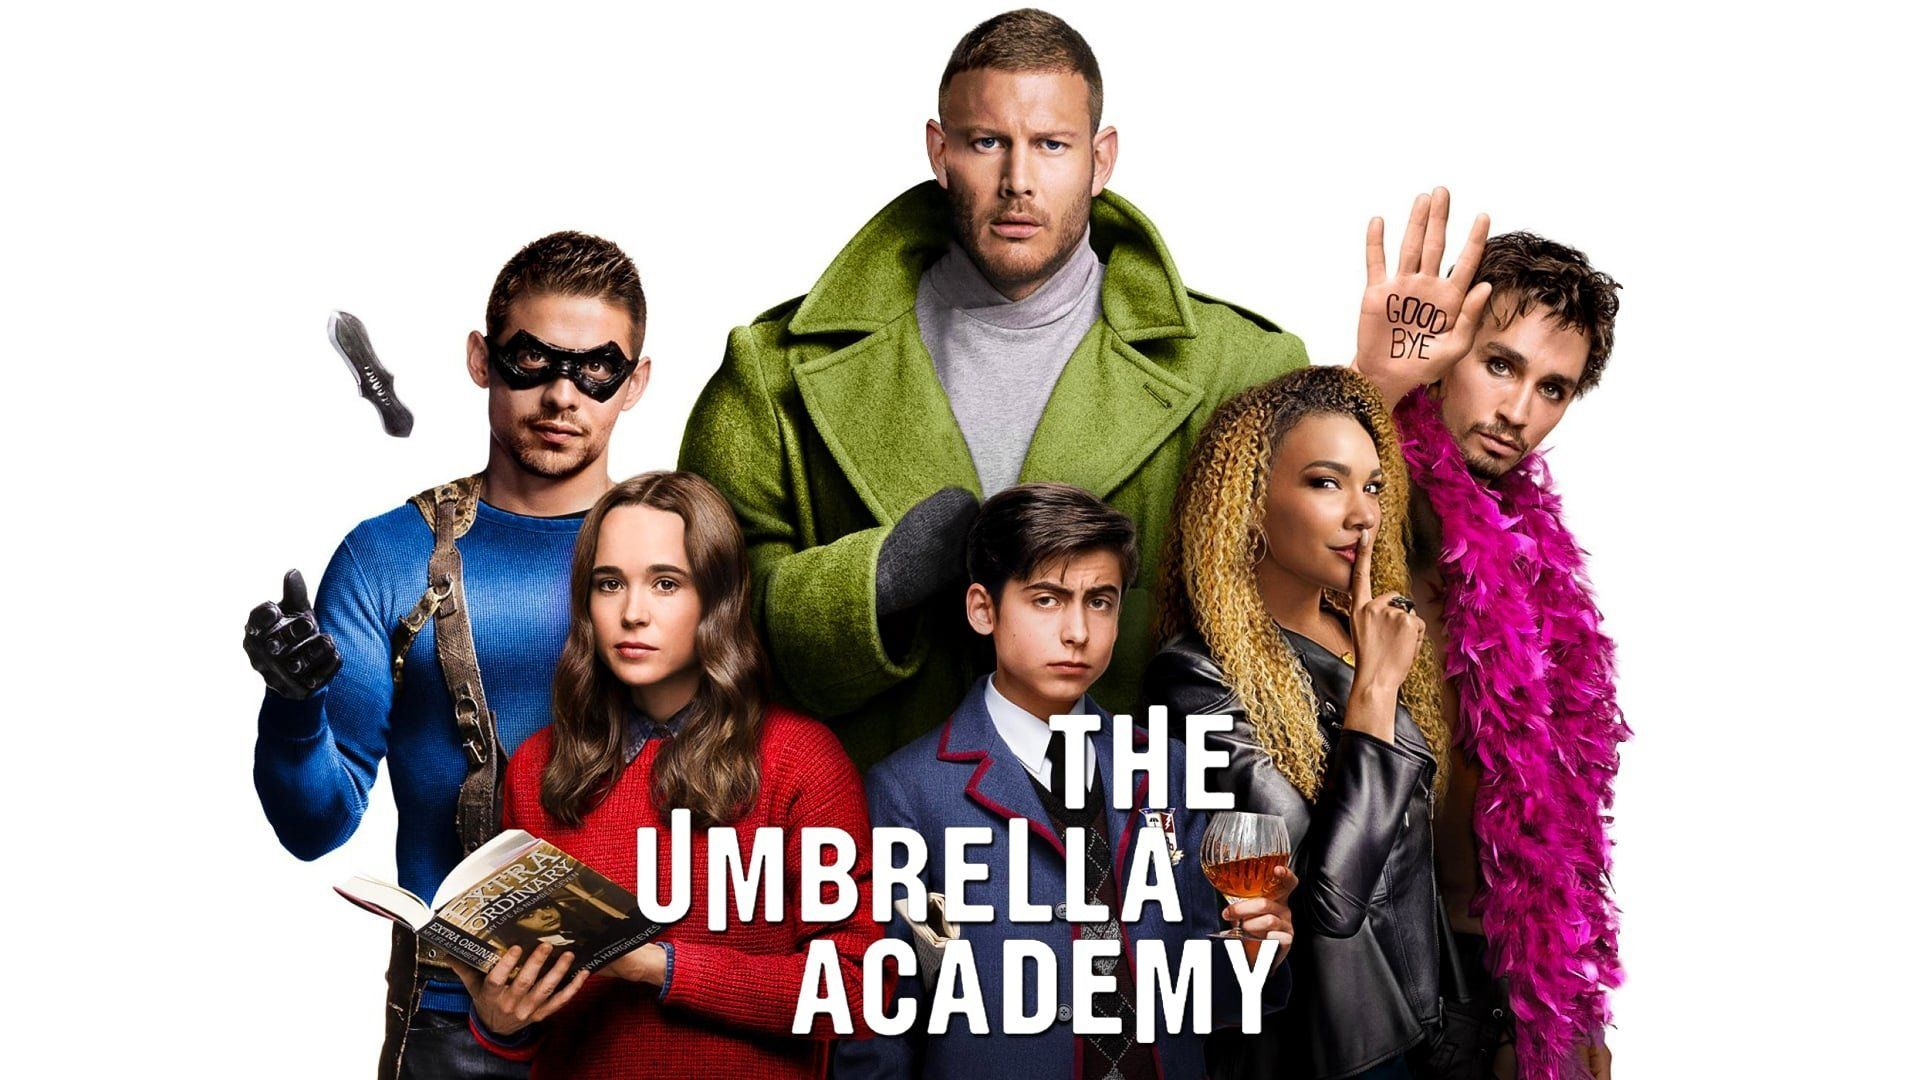 The Umbrella Academy Wallpapers - Top Free The Umbrella ...